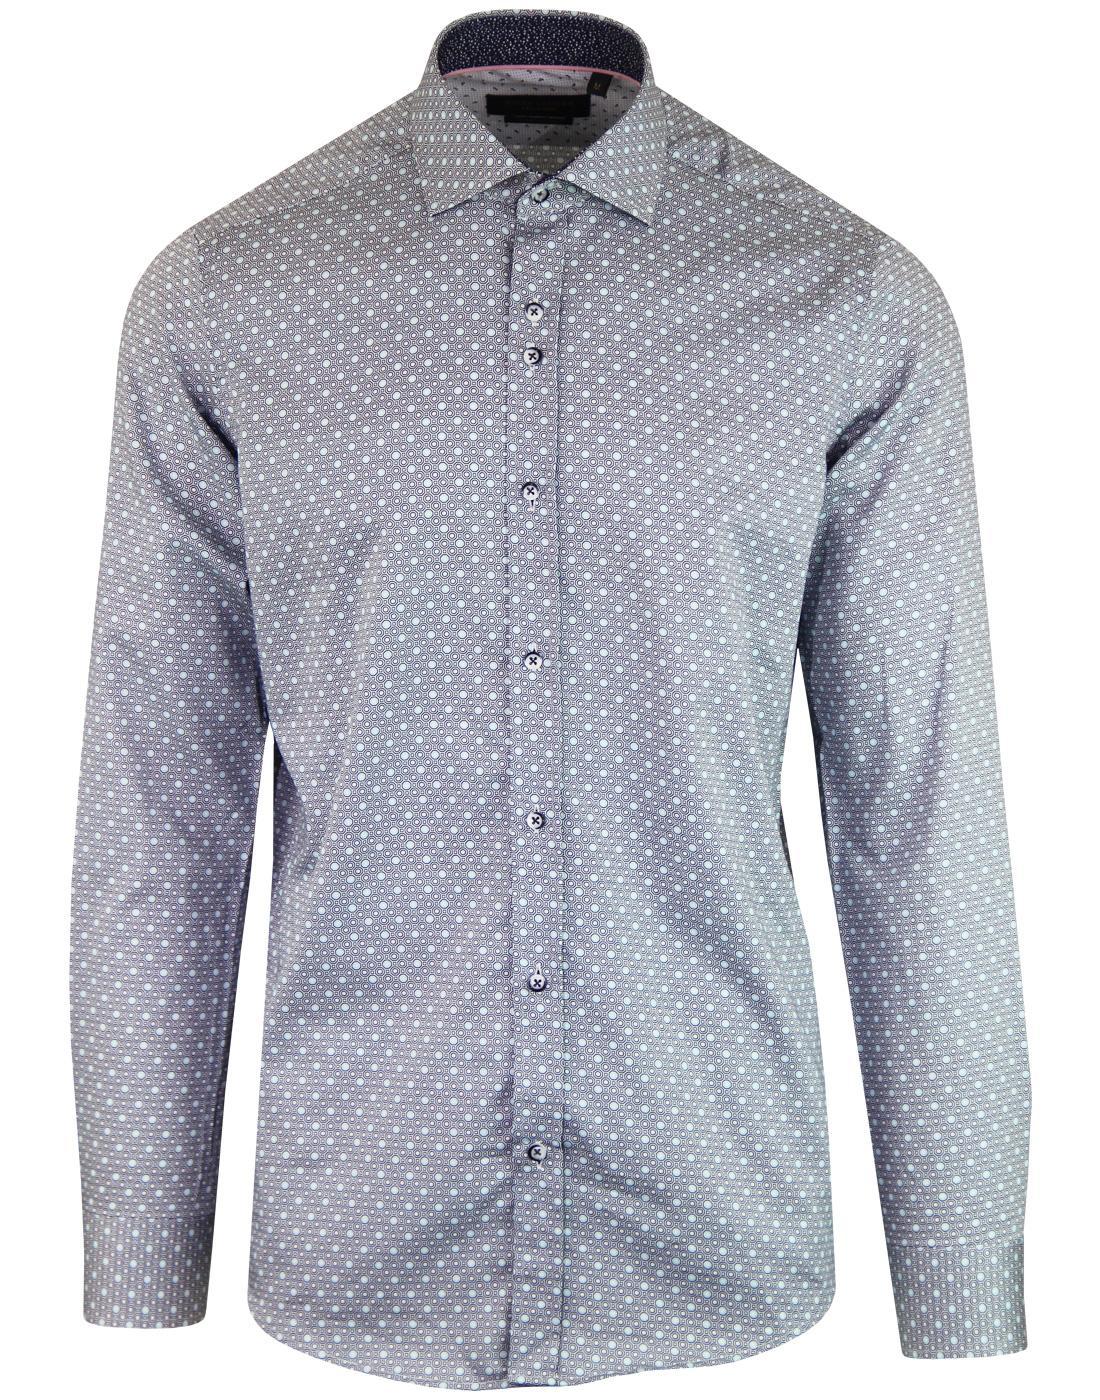 GUIDE LONDON 60s Mod Geo Honeycomb Bubble Shirt